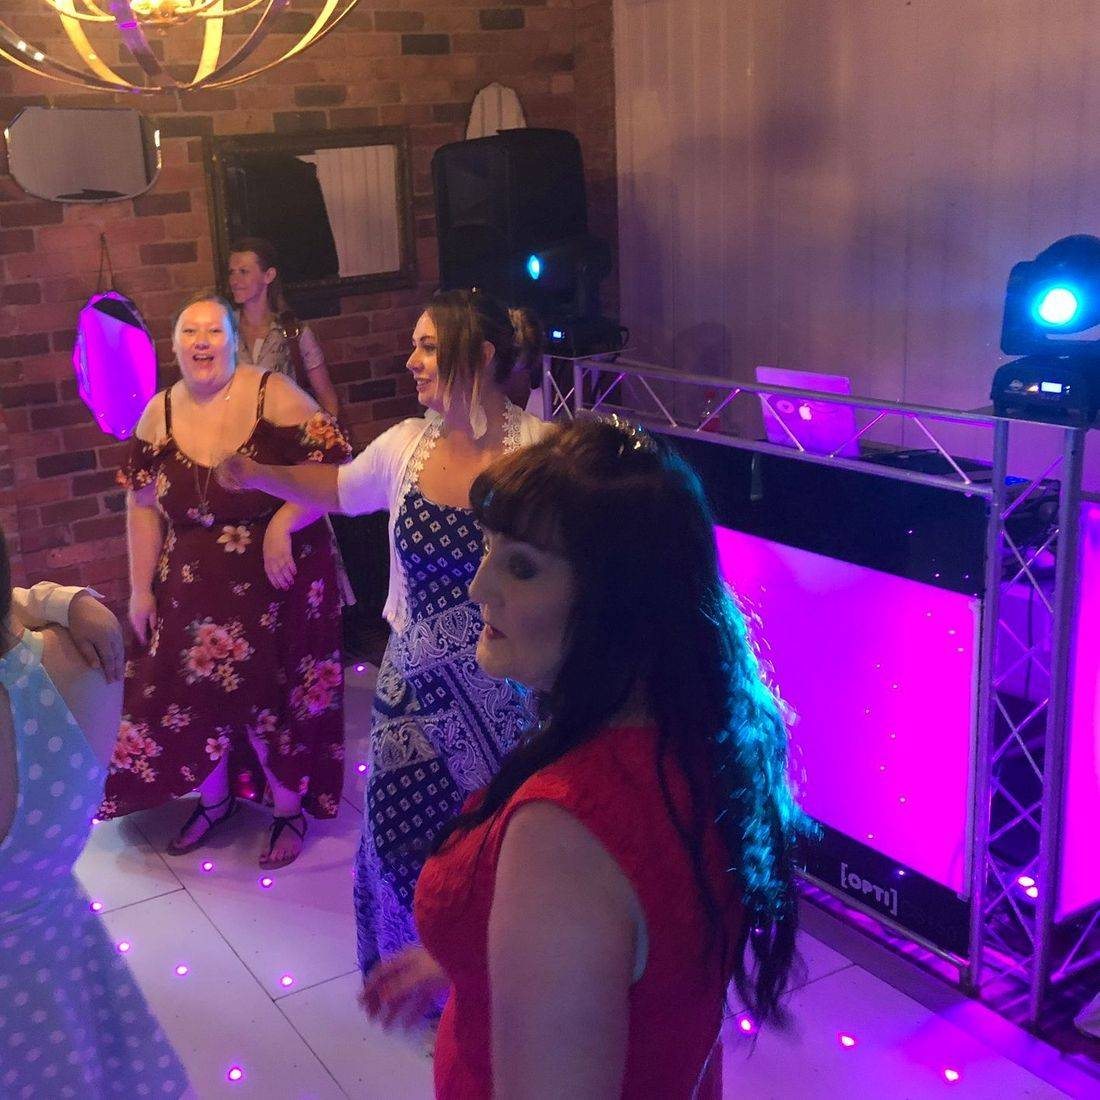 #Worcesterhsire #wedding #dj #weddingentertainment #barn #barnwedding #leddancefloor